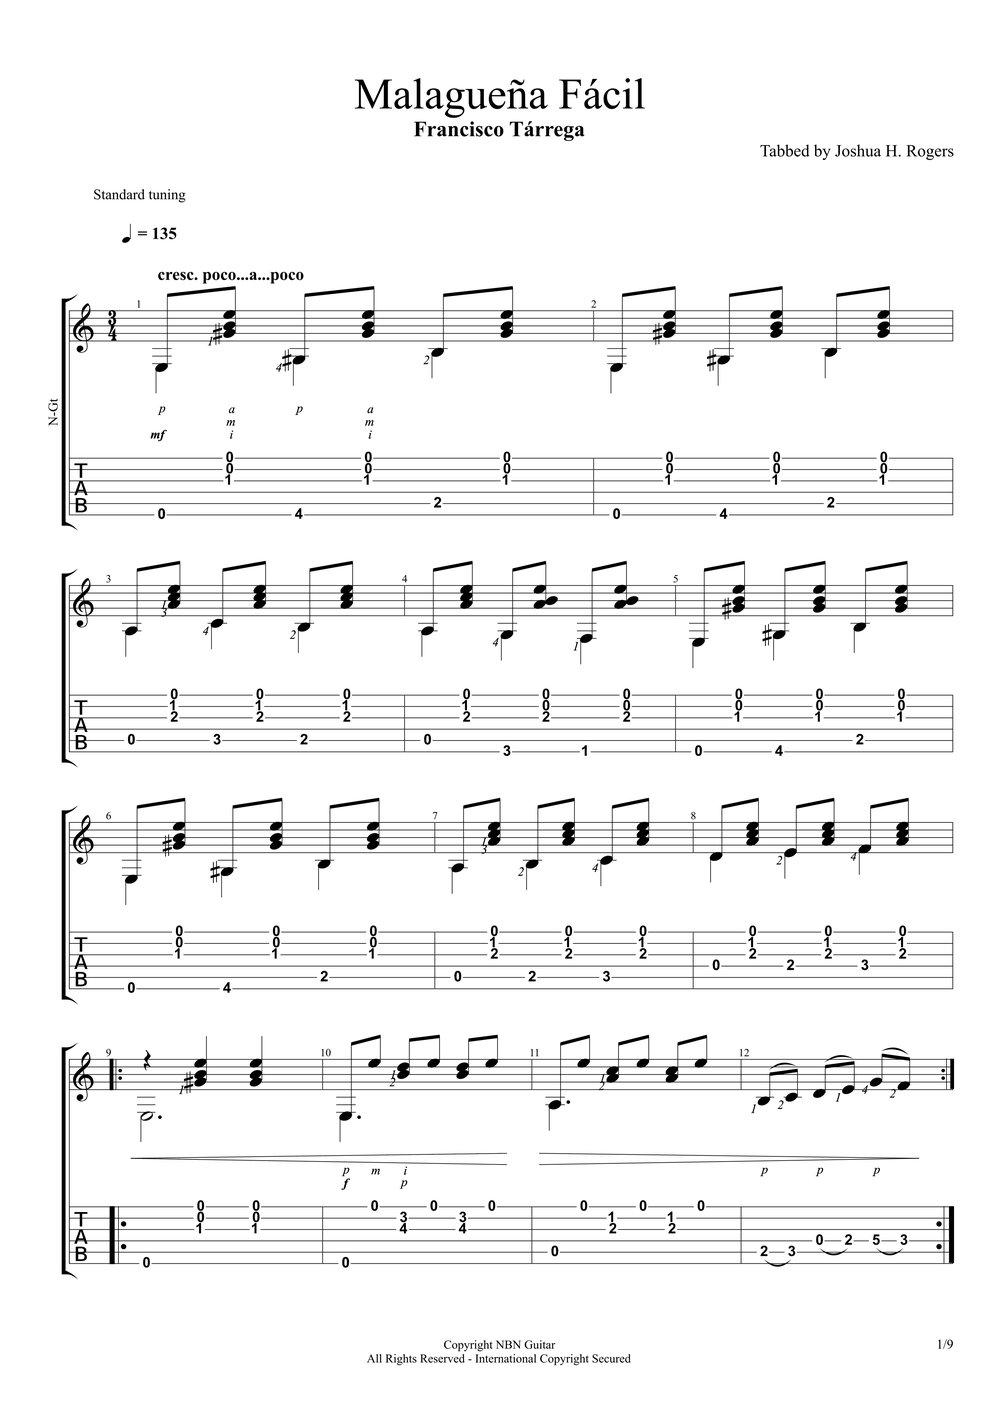 Malagueña Facil (Sheet Music & Tabs)-p03.jpg